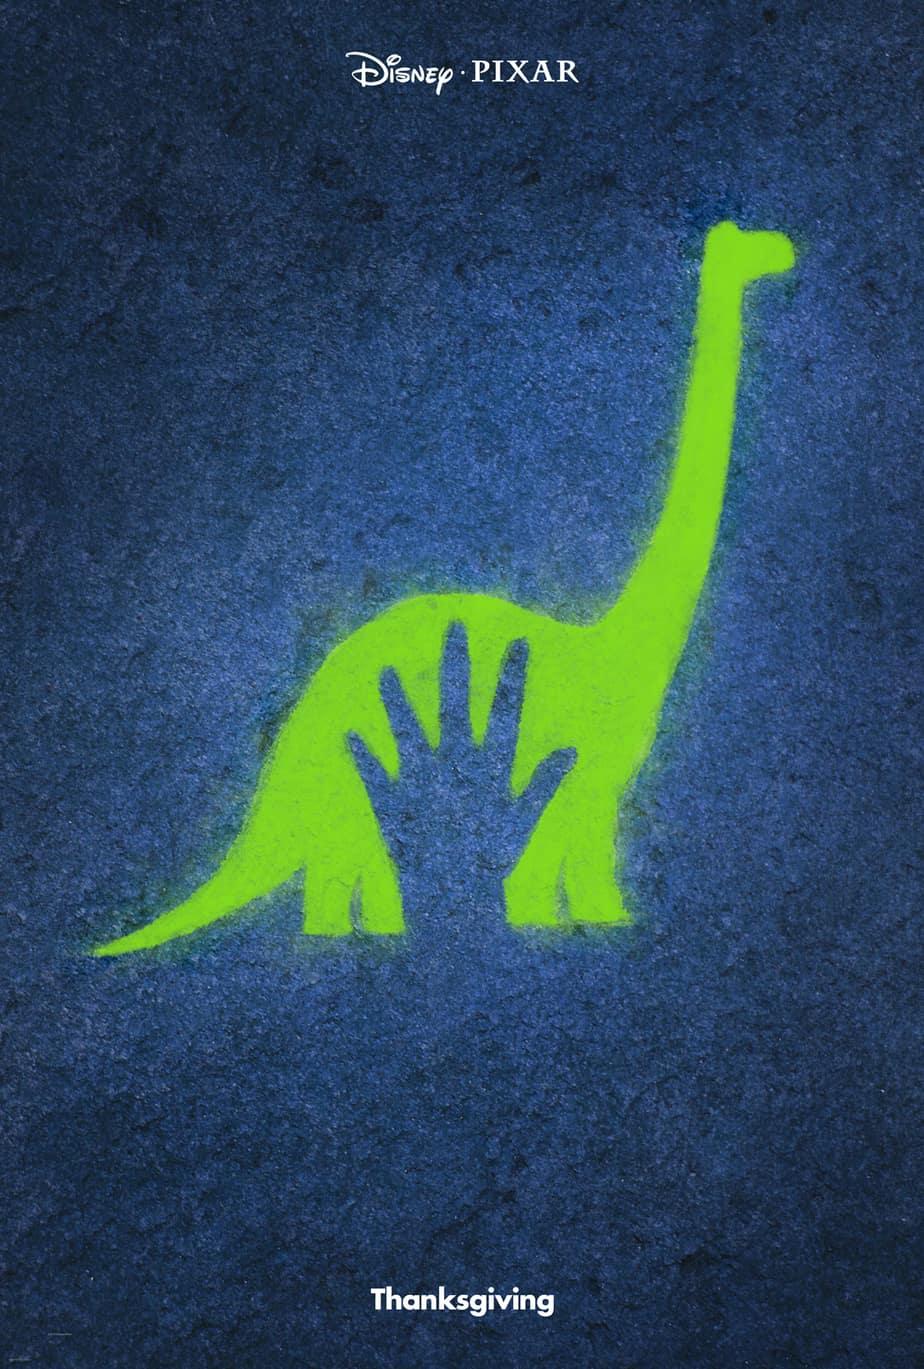 Movie Sneak Peek: Disney – Pixar's The Good Dinosaur